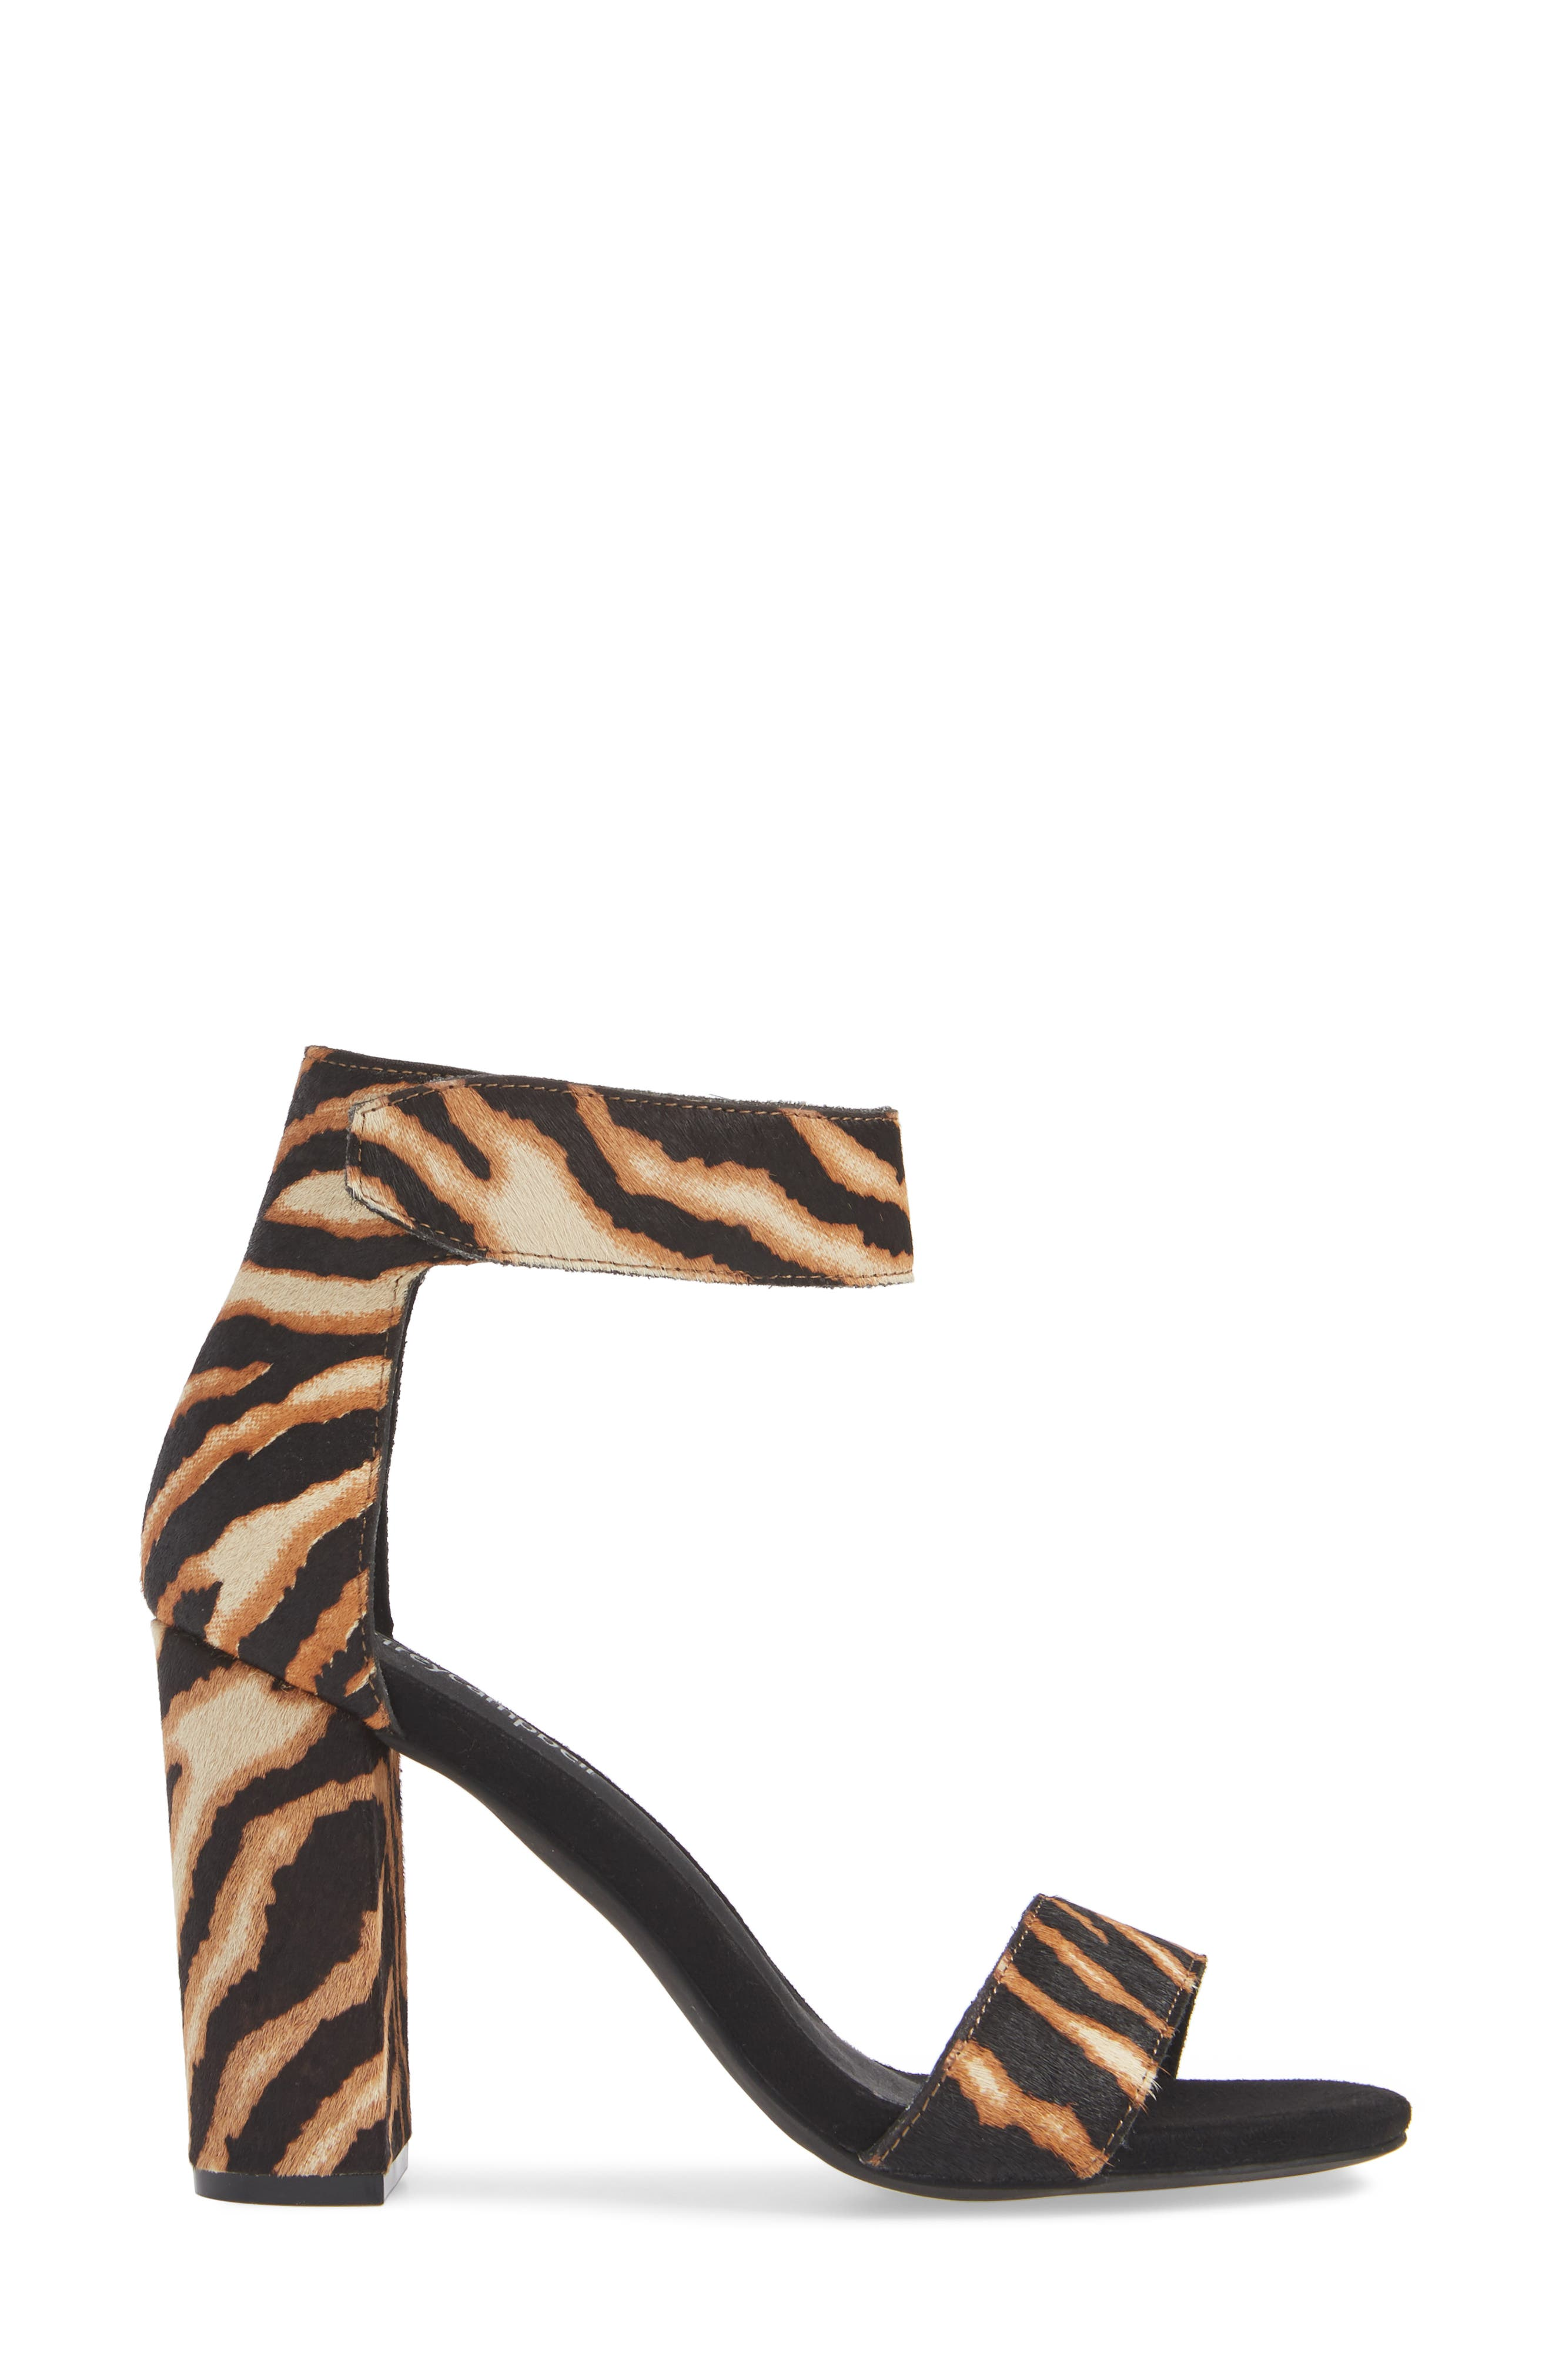 JEFFREY CAMPBELL,                             Lindsay Genuine Calf Hair Ankle Strap Sandal,                             Alternate thumbnail 3, color,                             BEIGE ZEBRA PRINT LEATHER